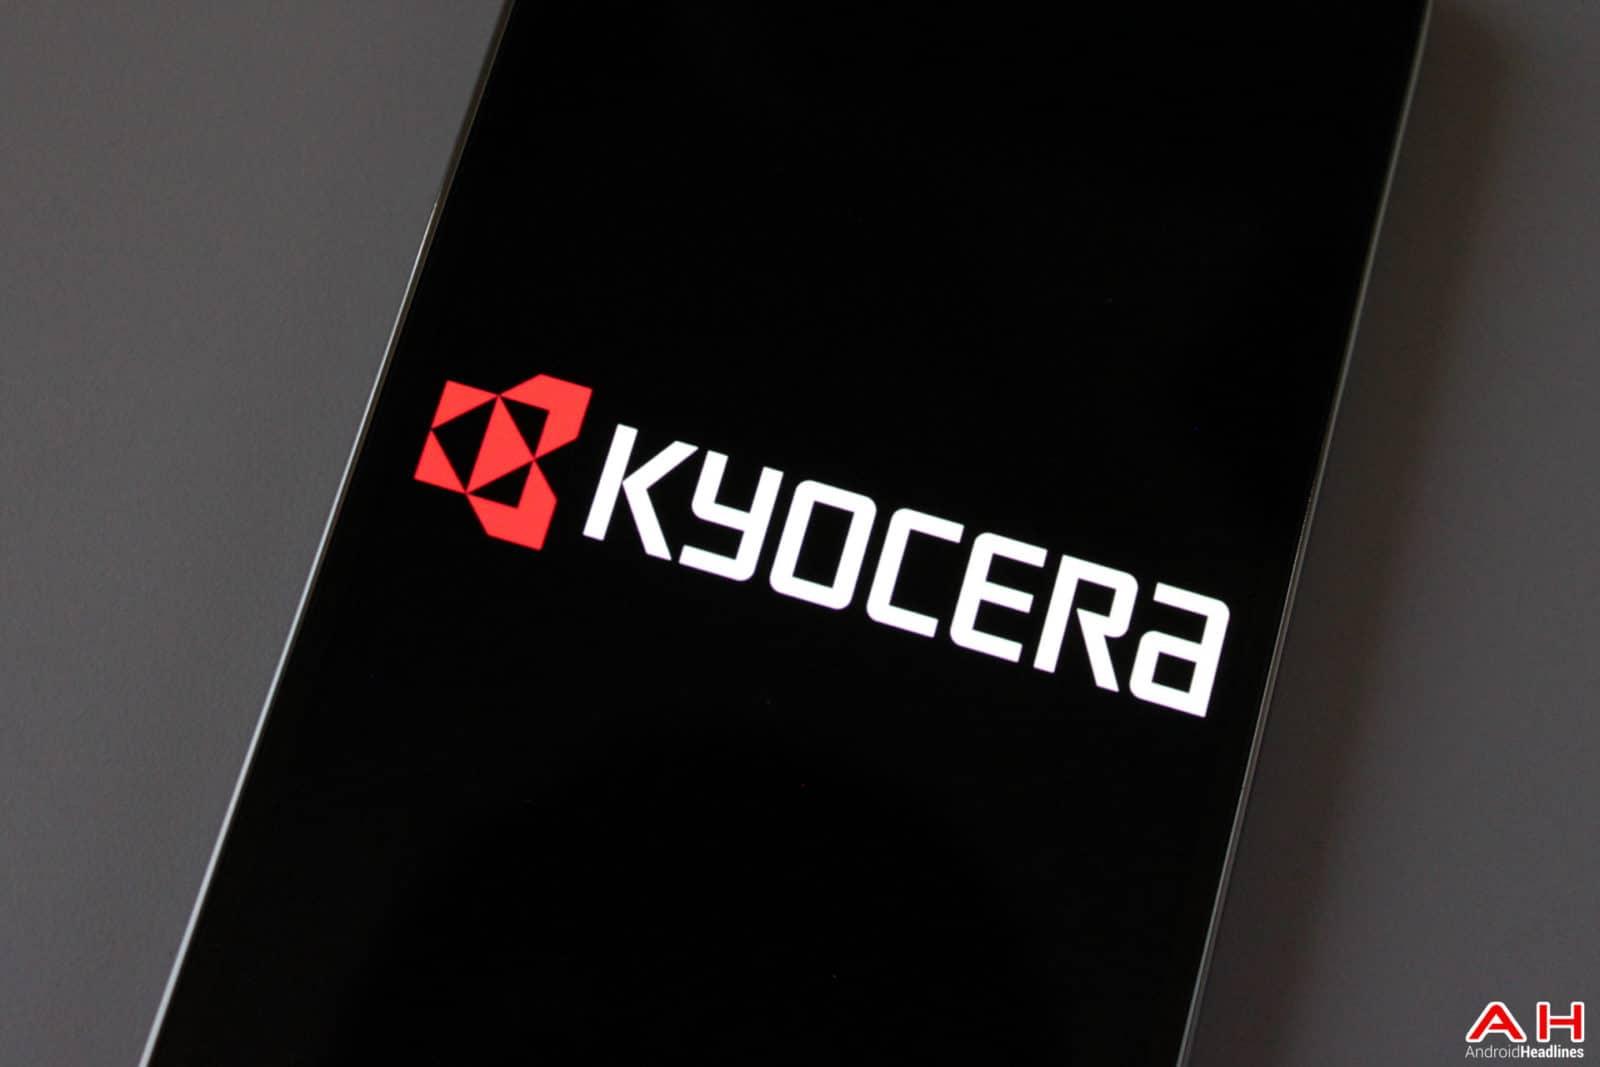 AH Kyocera LOGO -12